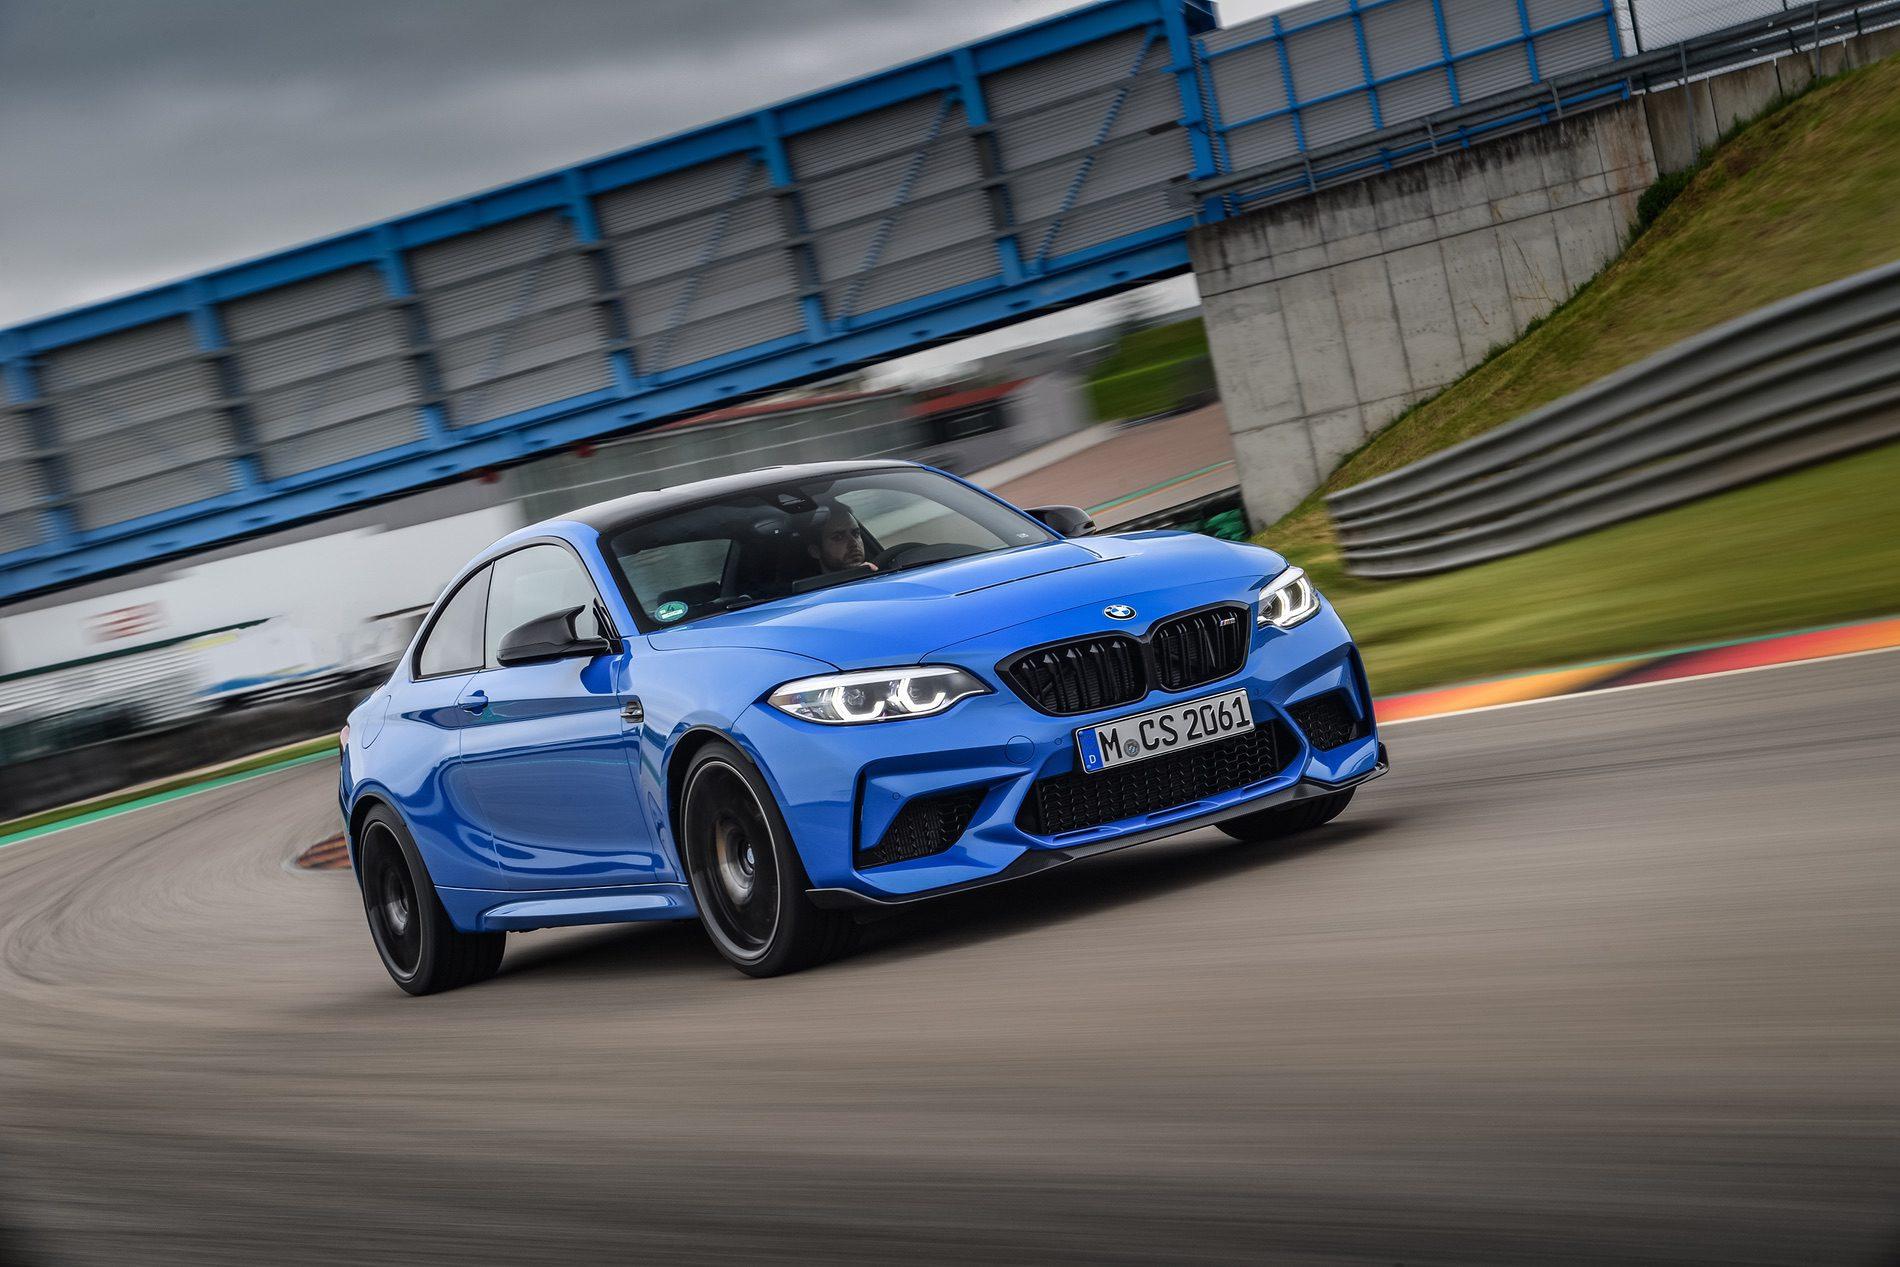 2021 BMW M2 CS Misano Blue 16